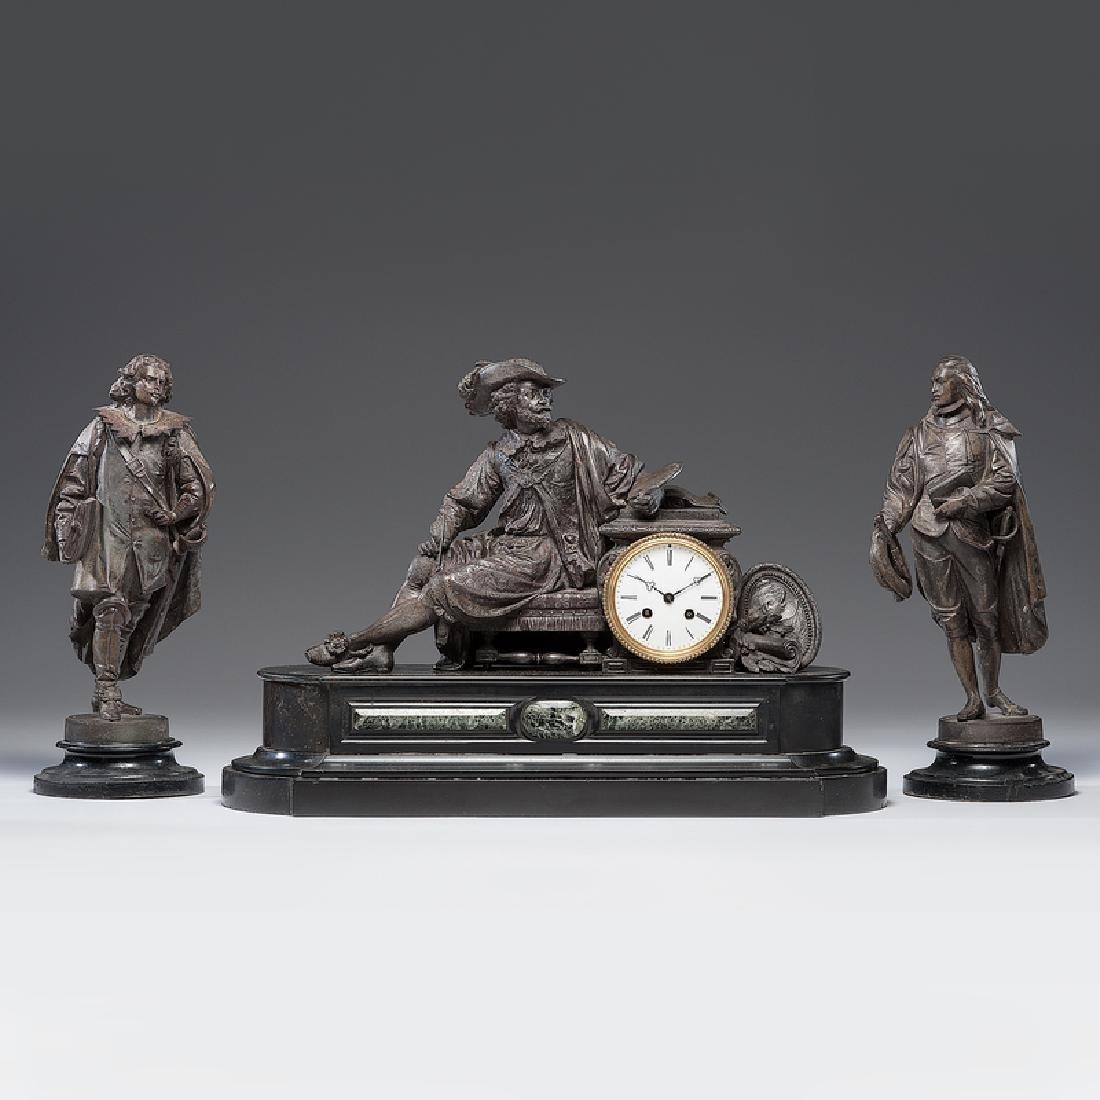 O. Berger Paris Mantel Clock Garniture